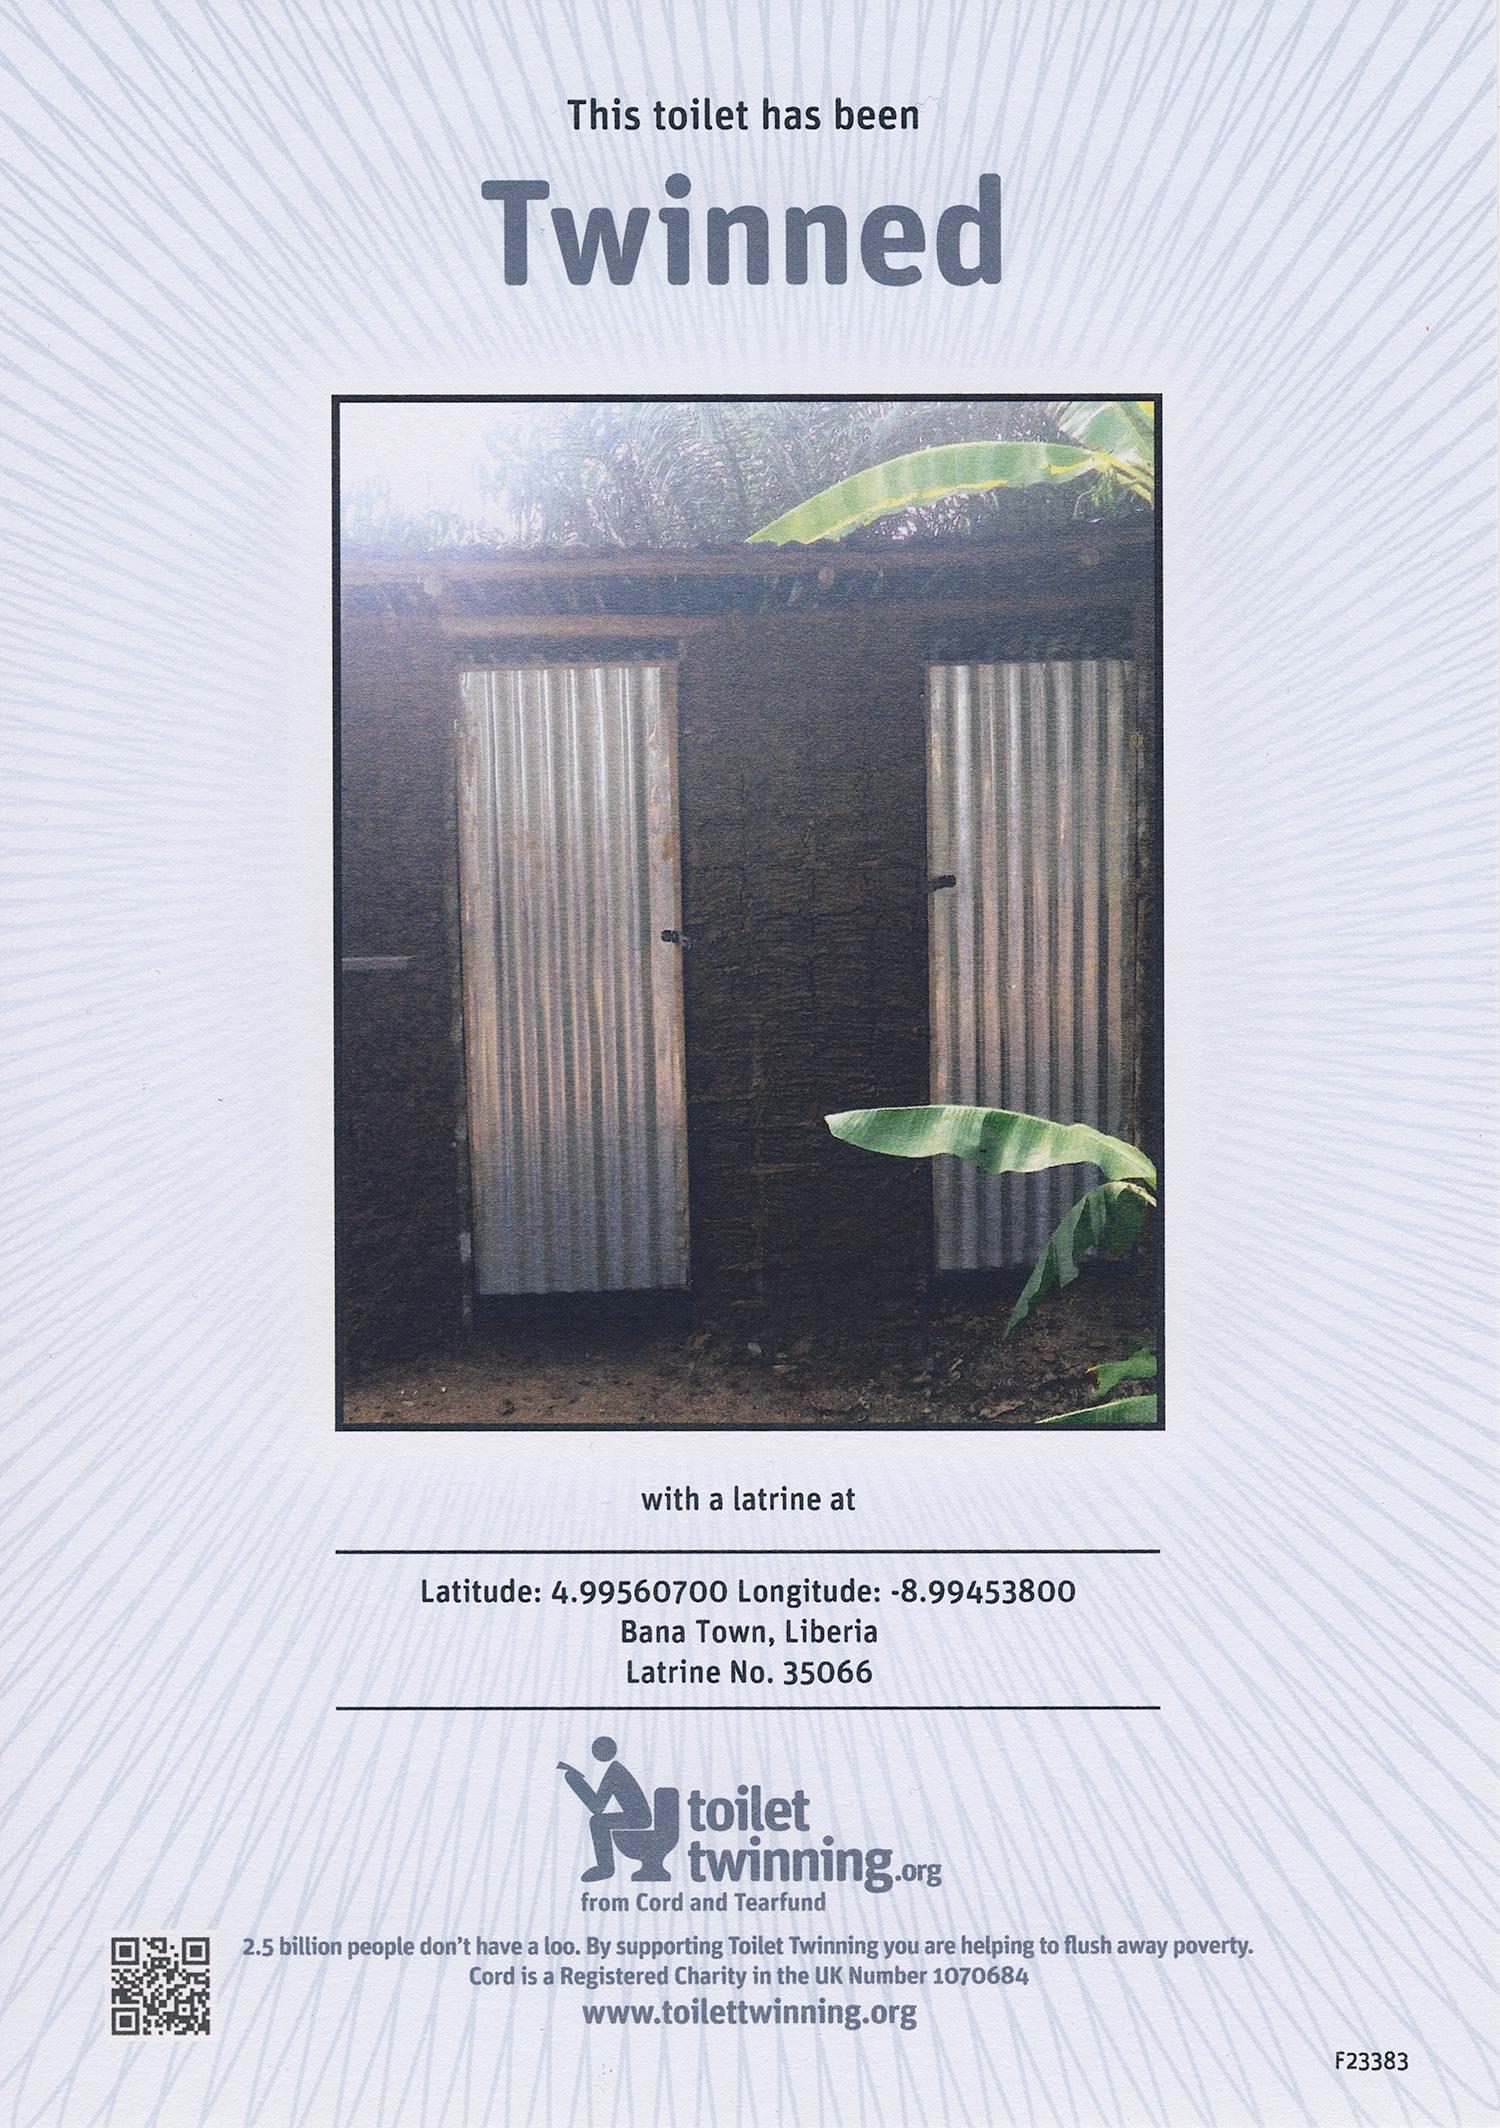 Toilet Twinning certificate.